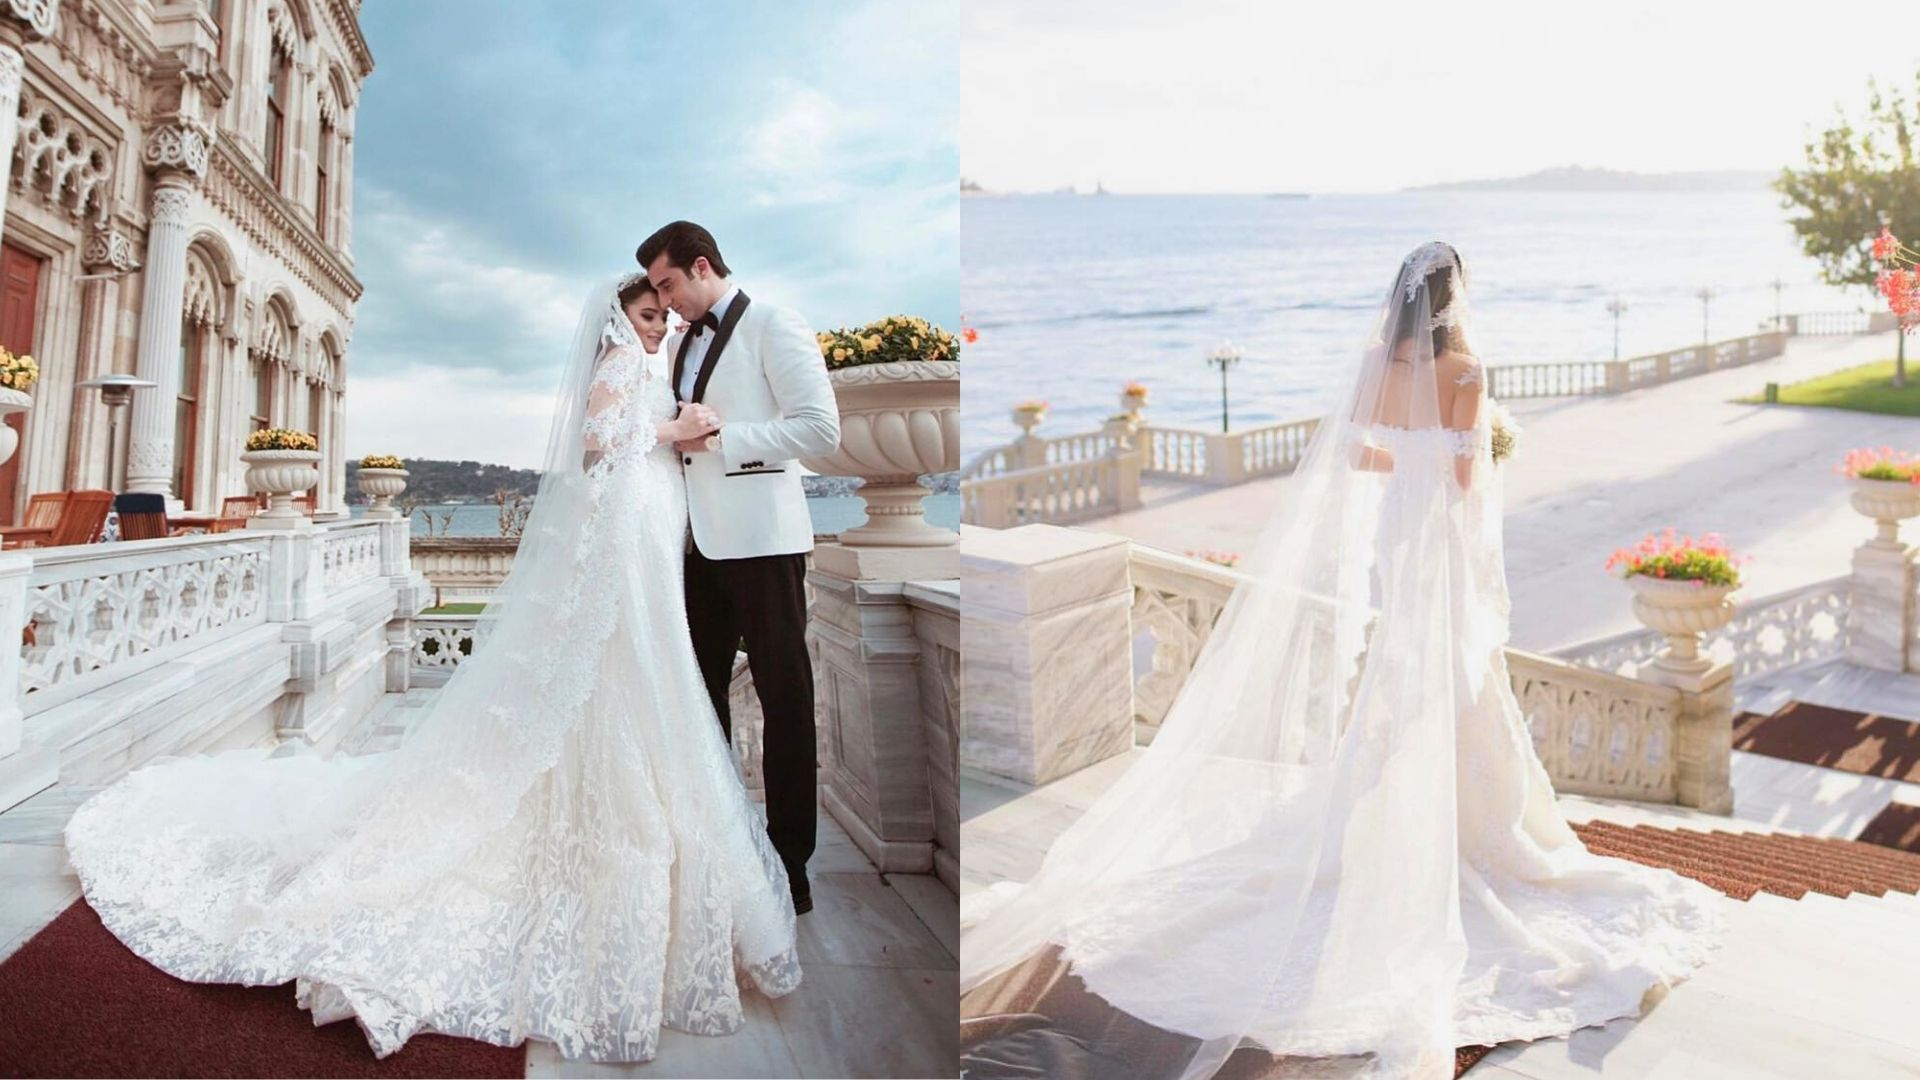 Contemplation Regarding the Range of Best Wedding Gowns